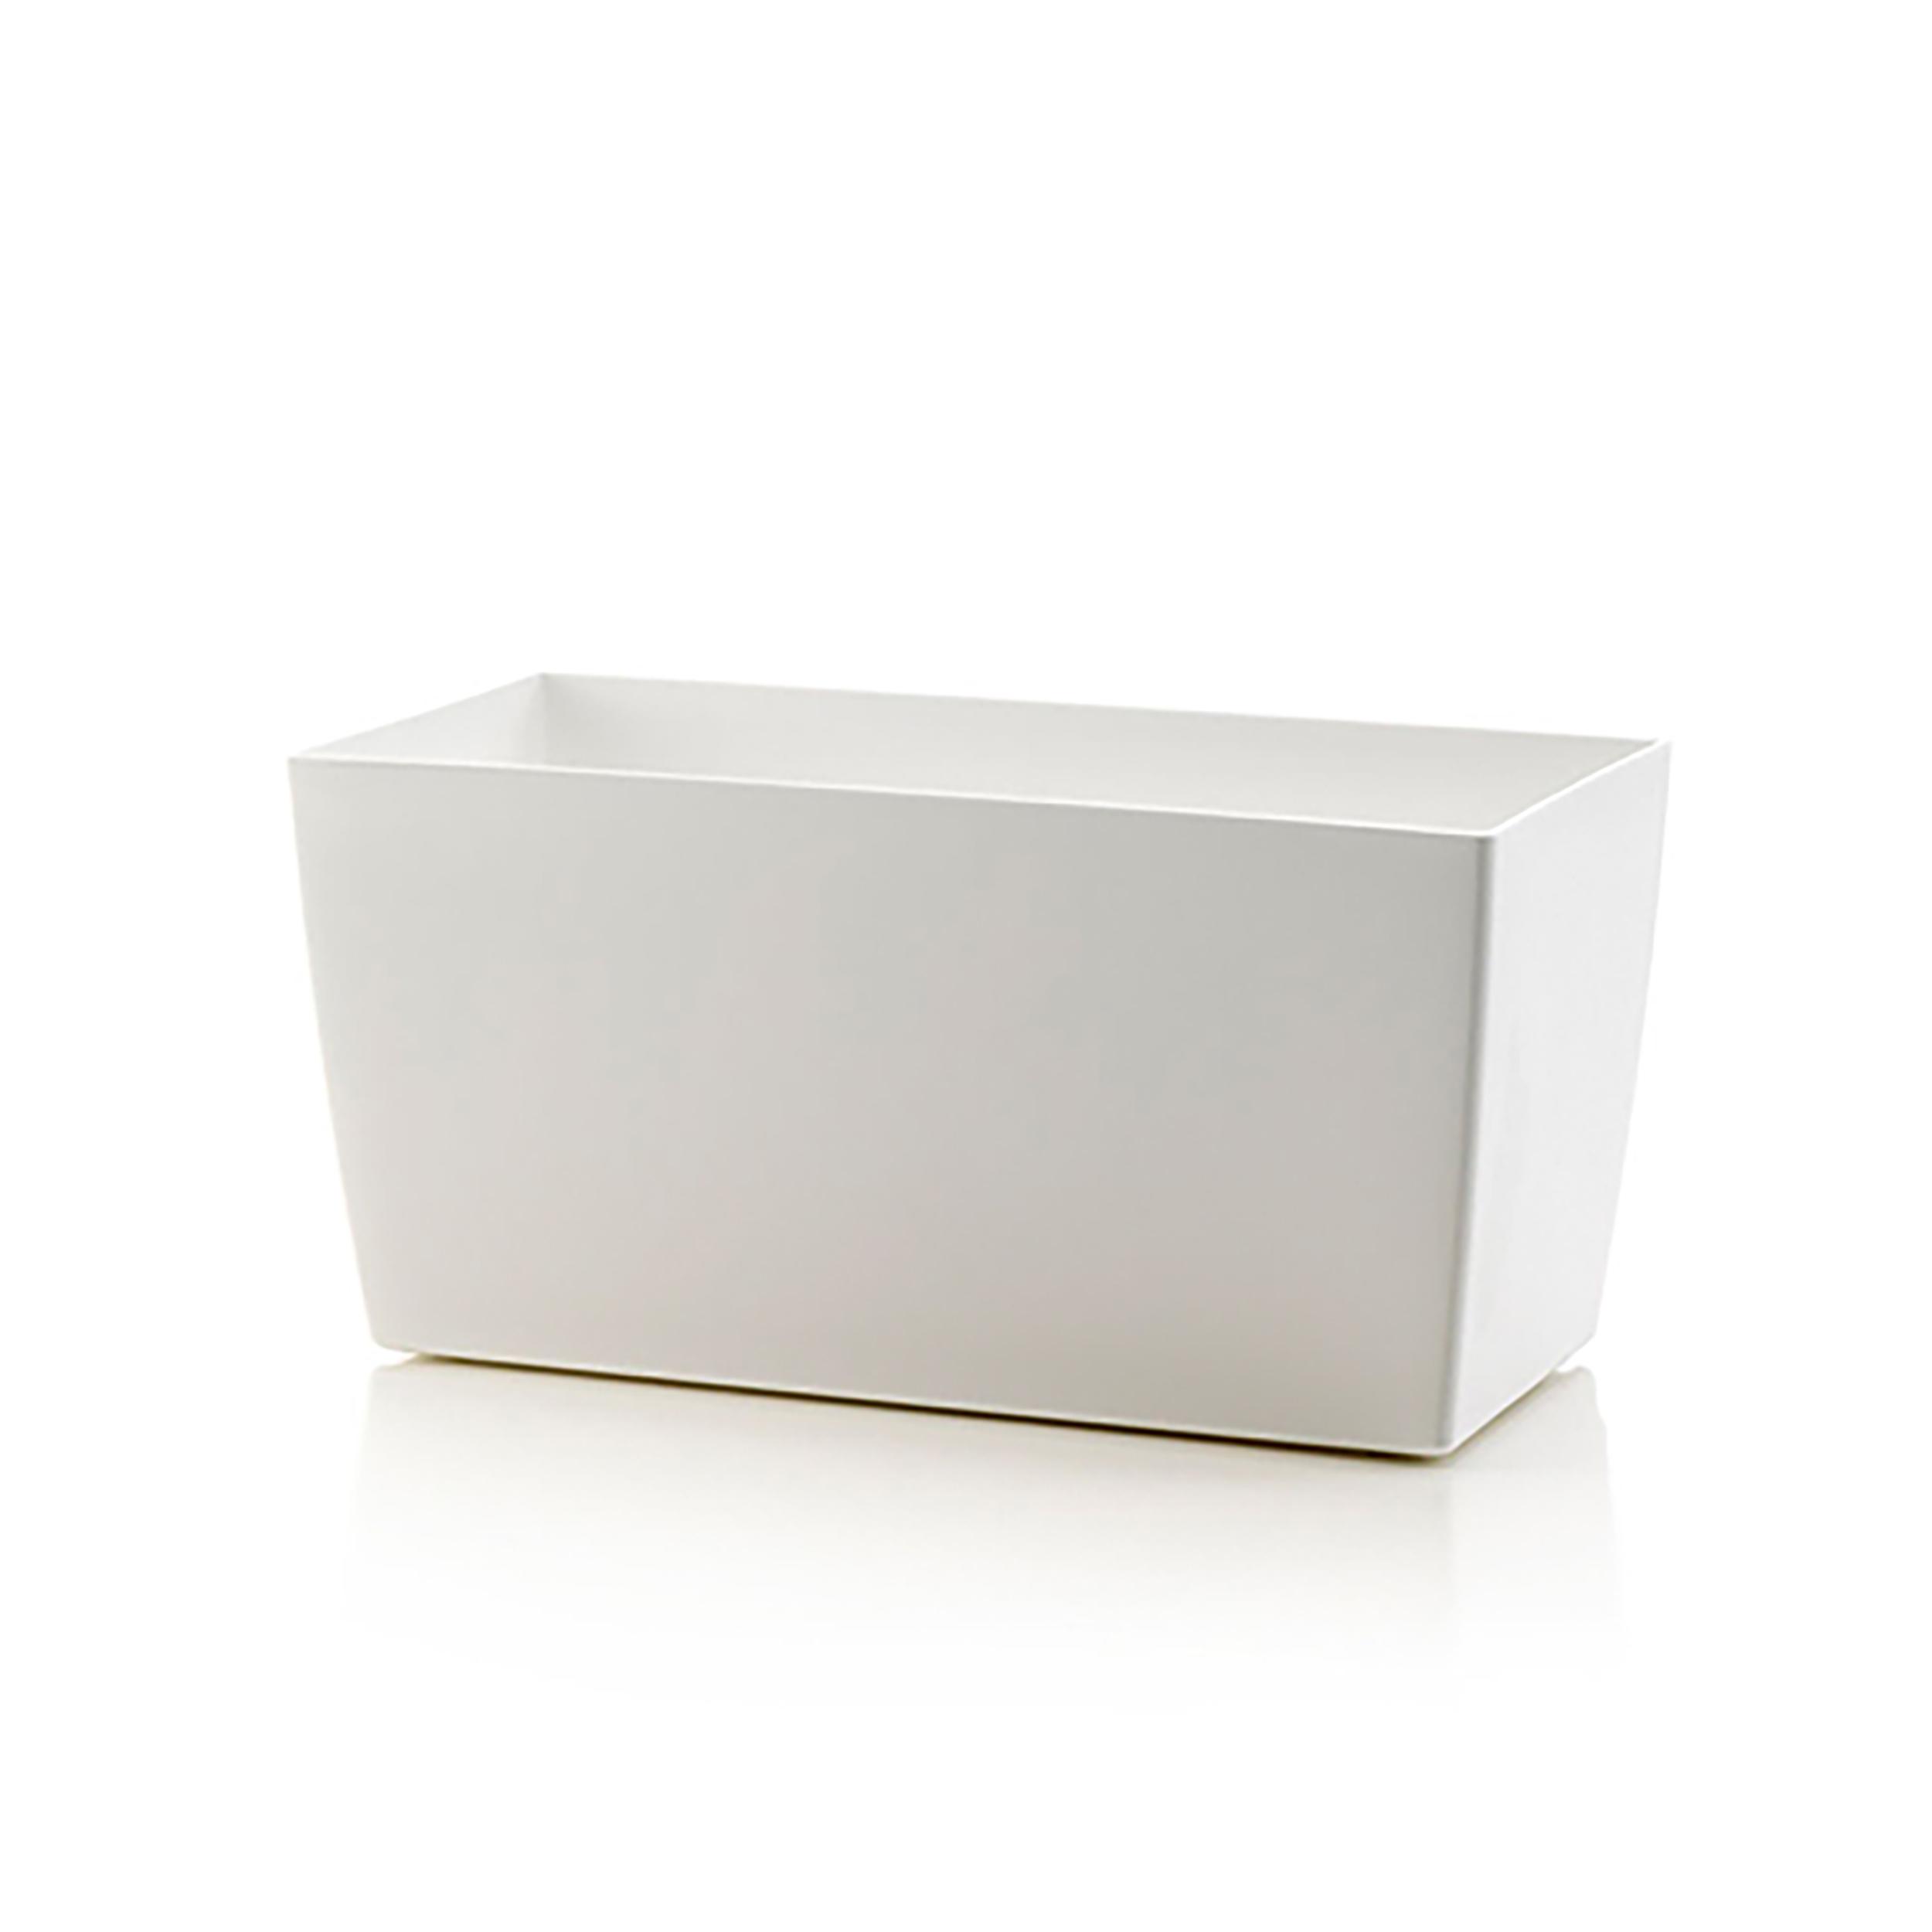 pflanztopf coimbra blumentopf pflanztopf pflanzk bel blumenk bel wei eckig neu ebay. Black Bedroom Furniture Sets. Home Design Ideas